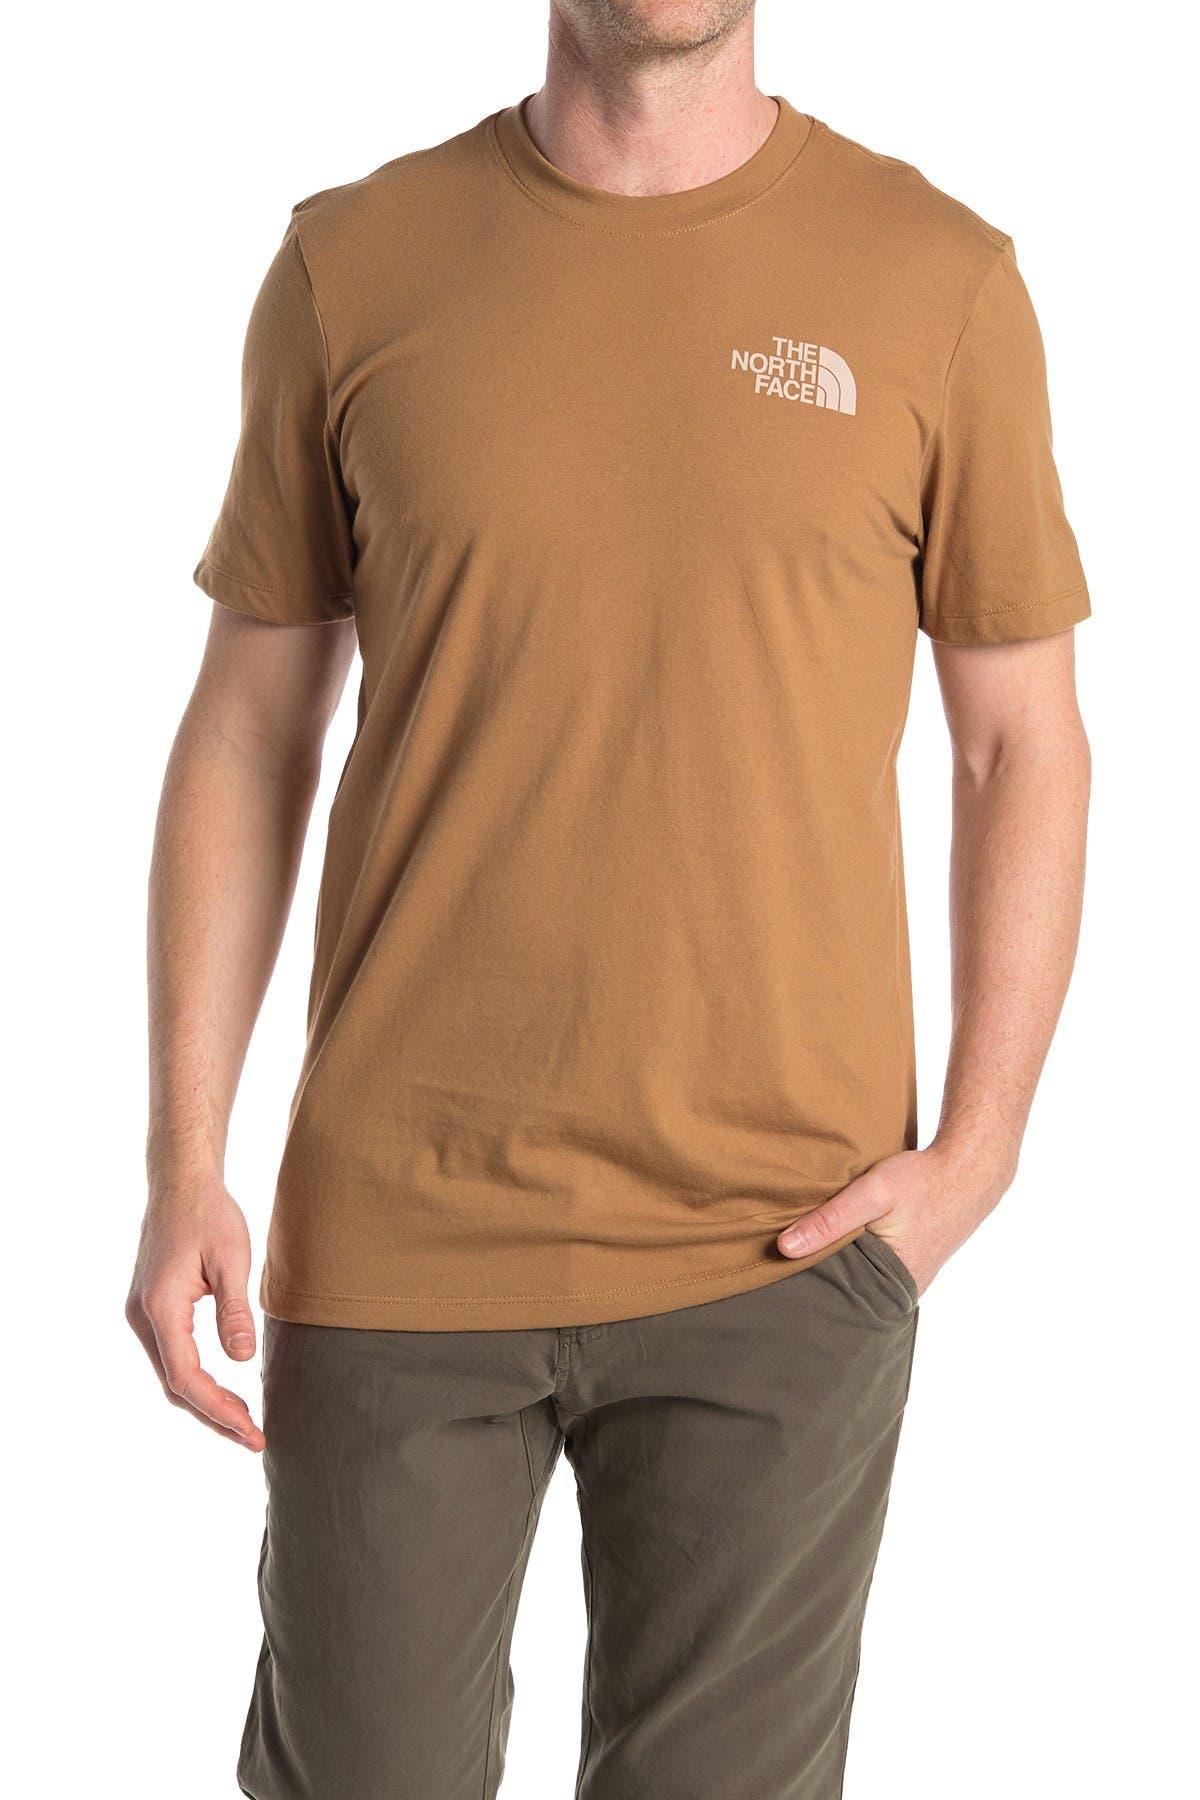 Image of The North Face Los Muros Son Para Escalarse Graphic T-Shirt